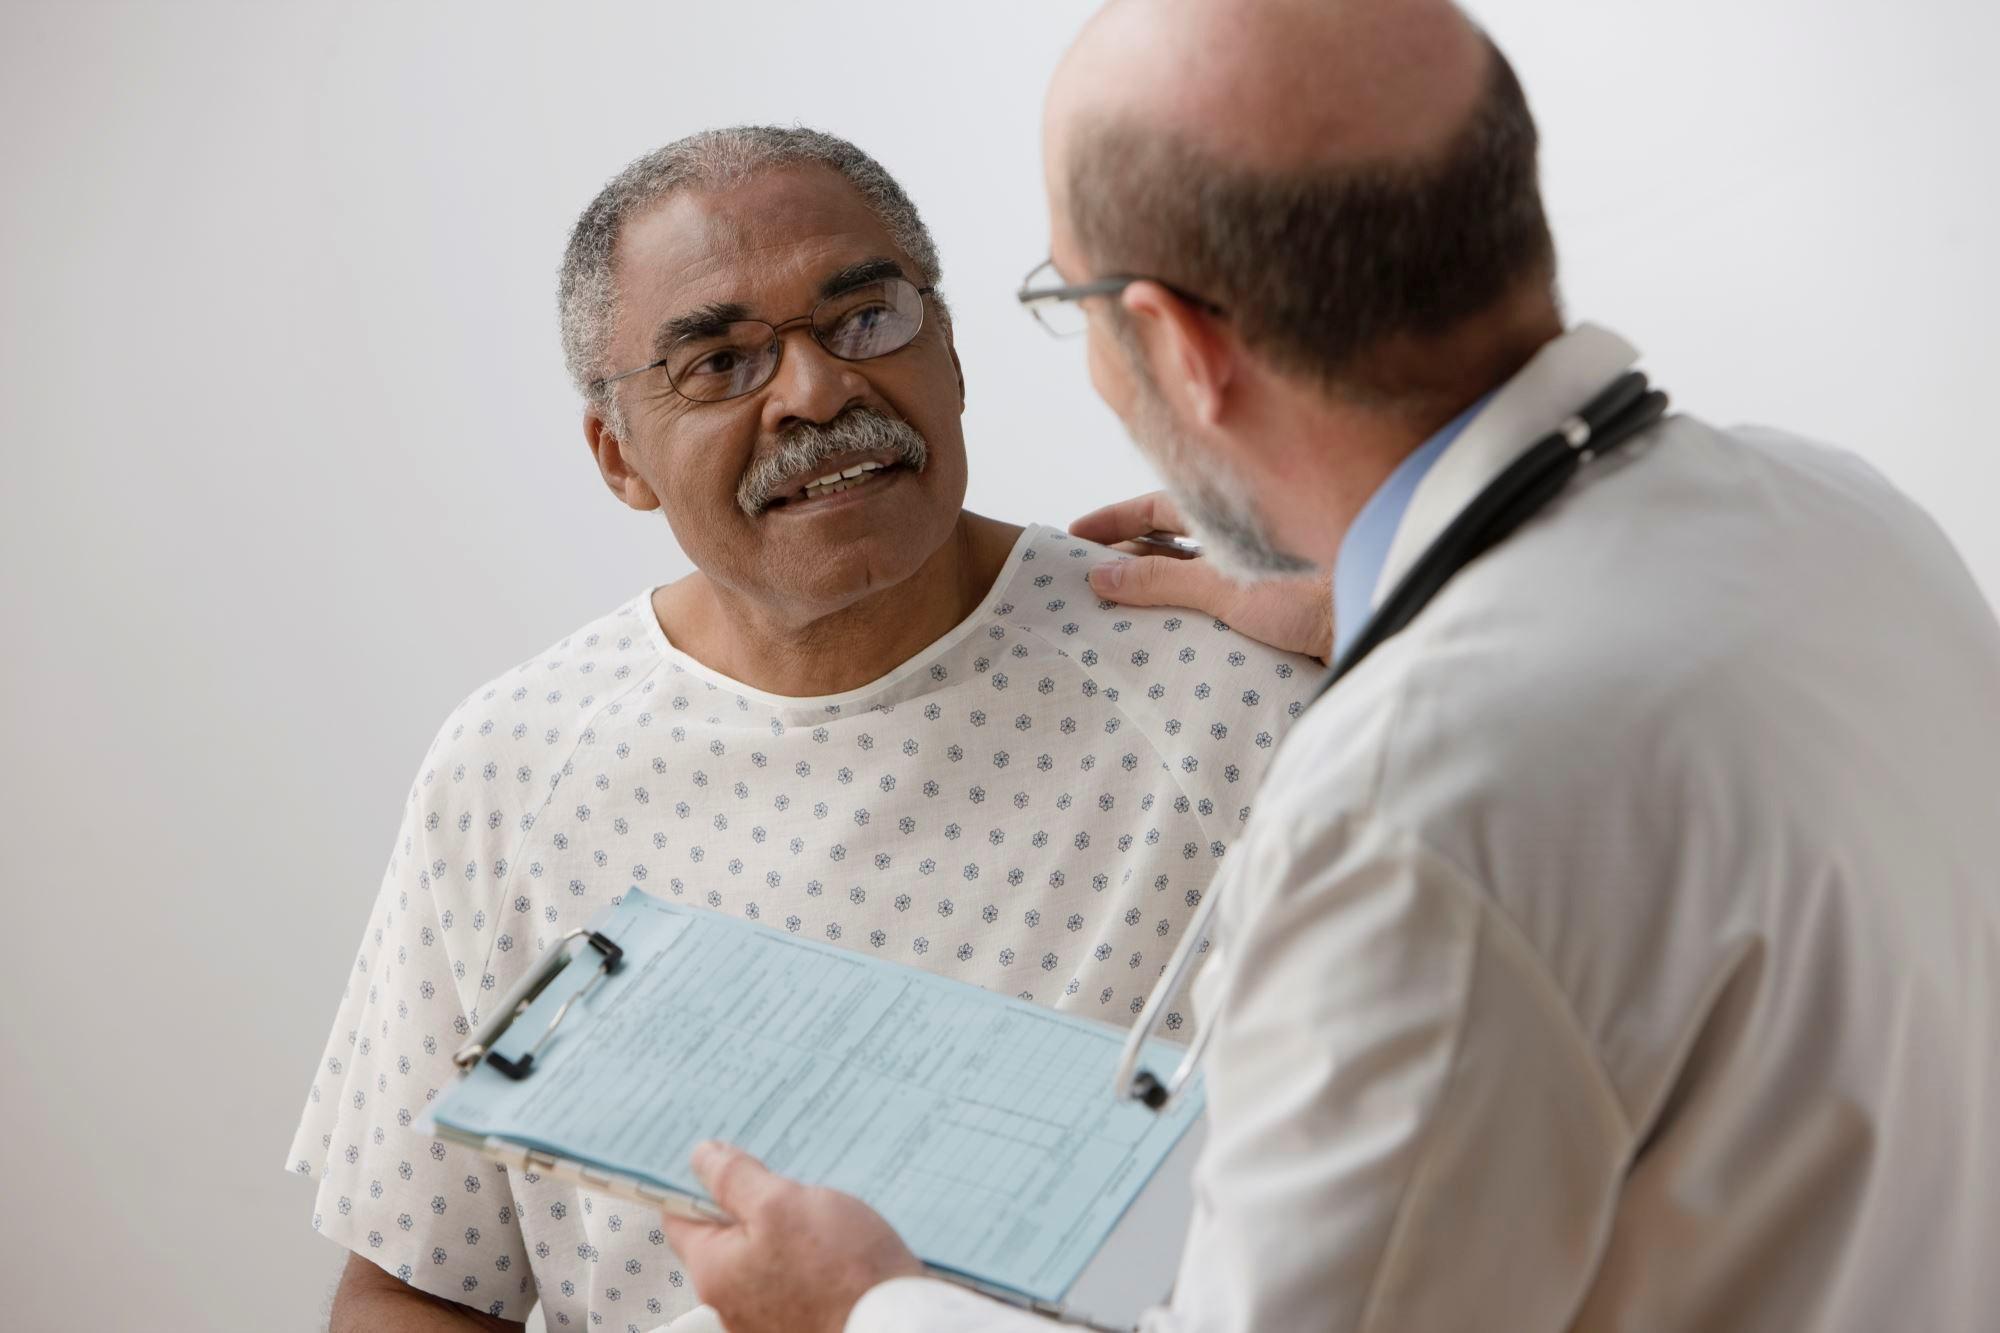 Sociodemographic Factors Affect Cardiovascular Health Behaviors